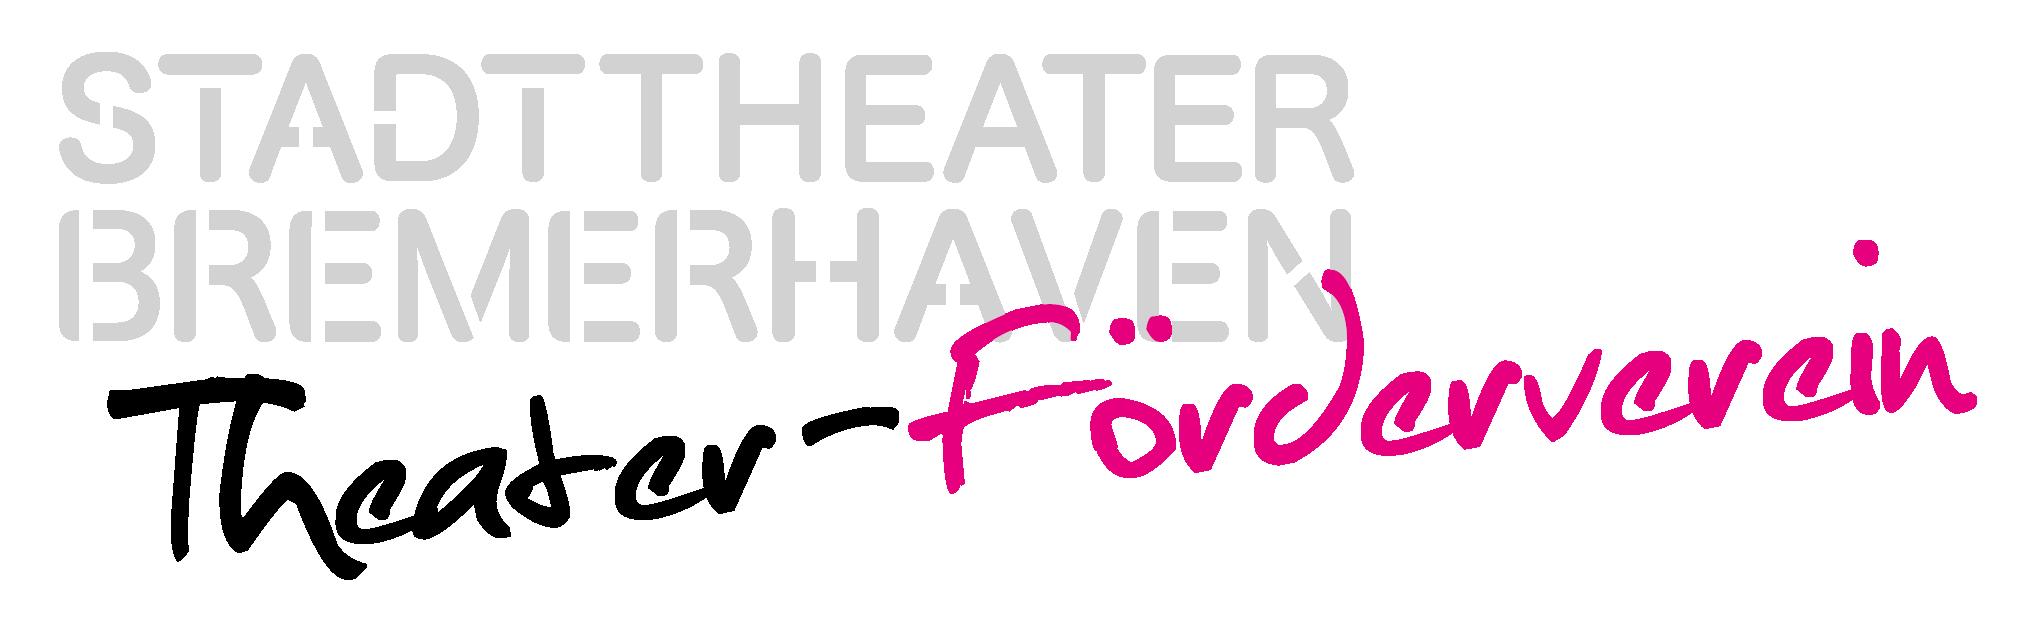 Theater Förderverein Bremerhaven